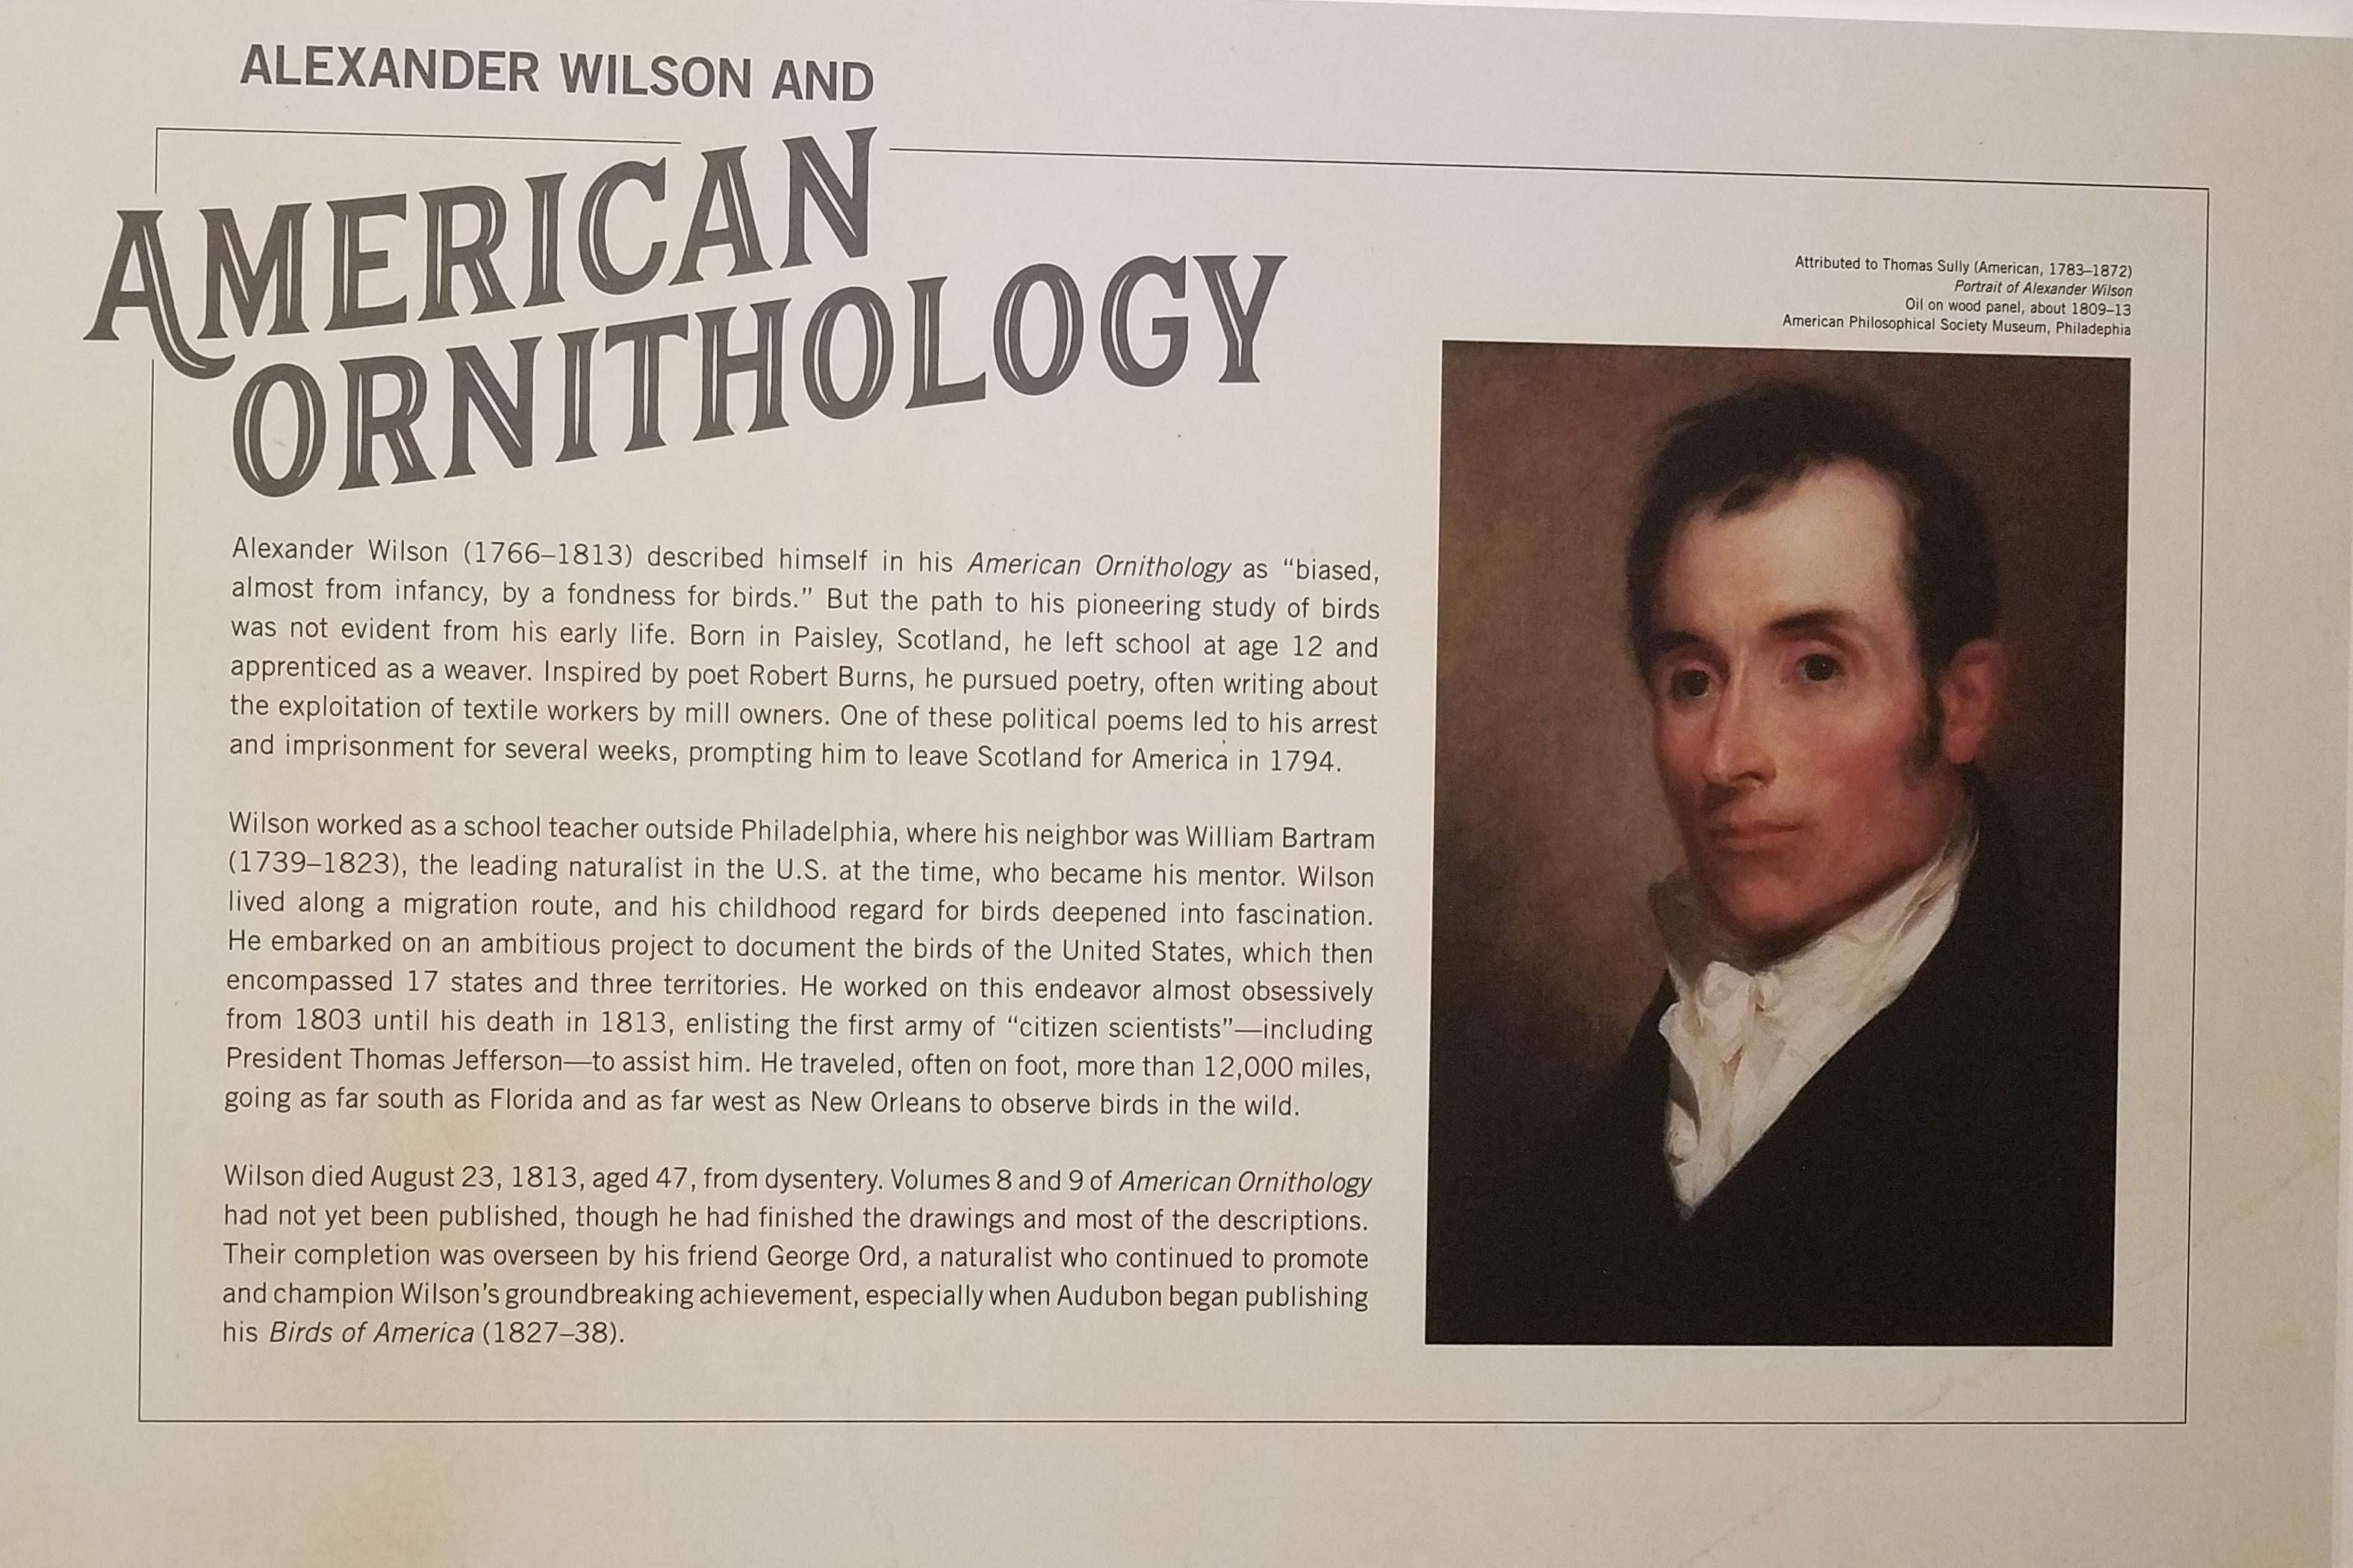 Before Audubon - Alexander Wilson exhibit at TMA - about Wilson